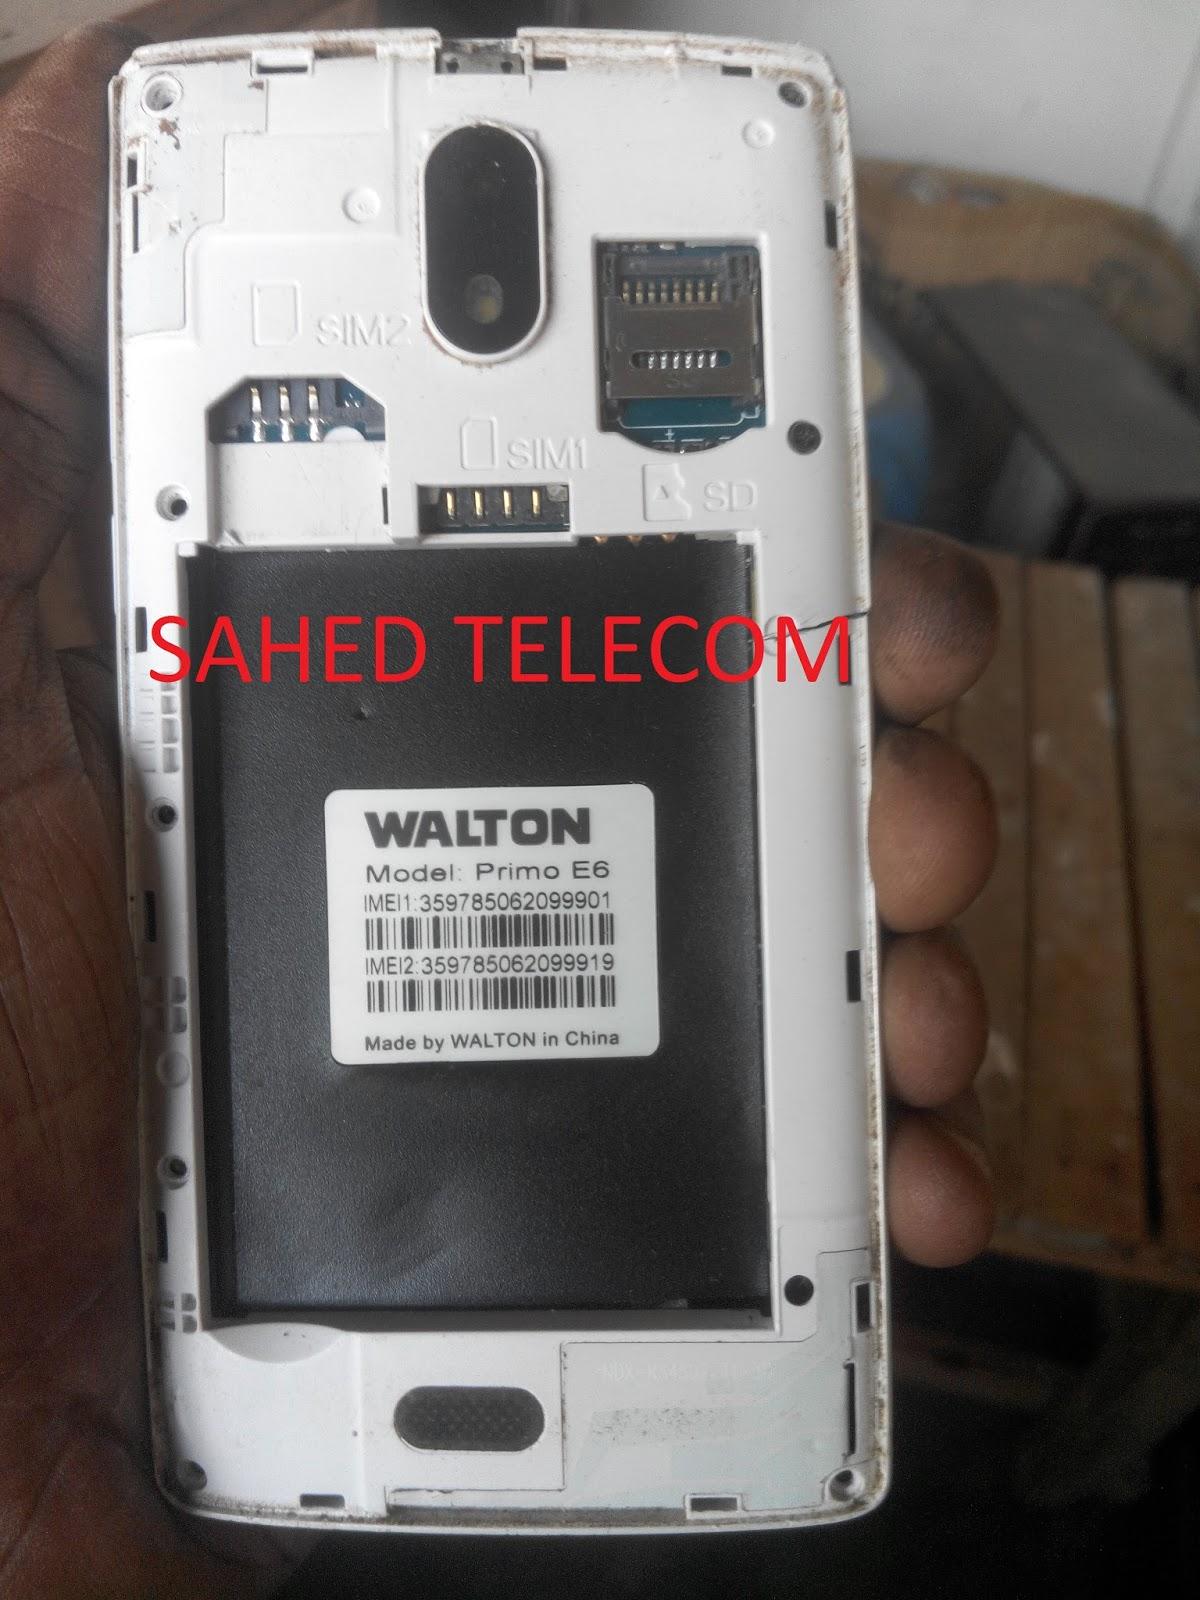 SAHED TELECOM: walton E6 flash file PAC FILE 5 1 SPD7731 100